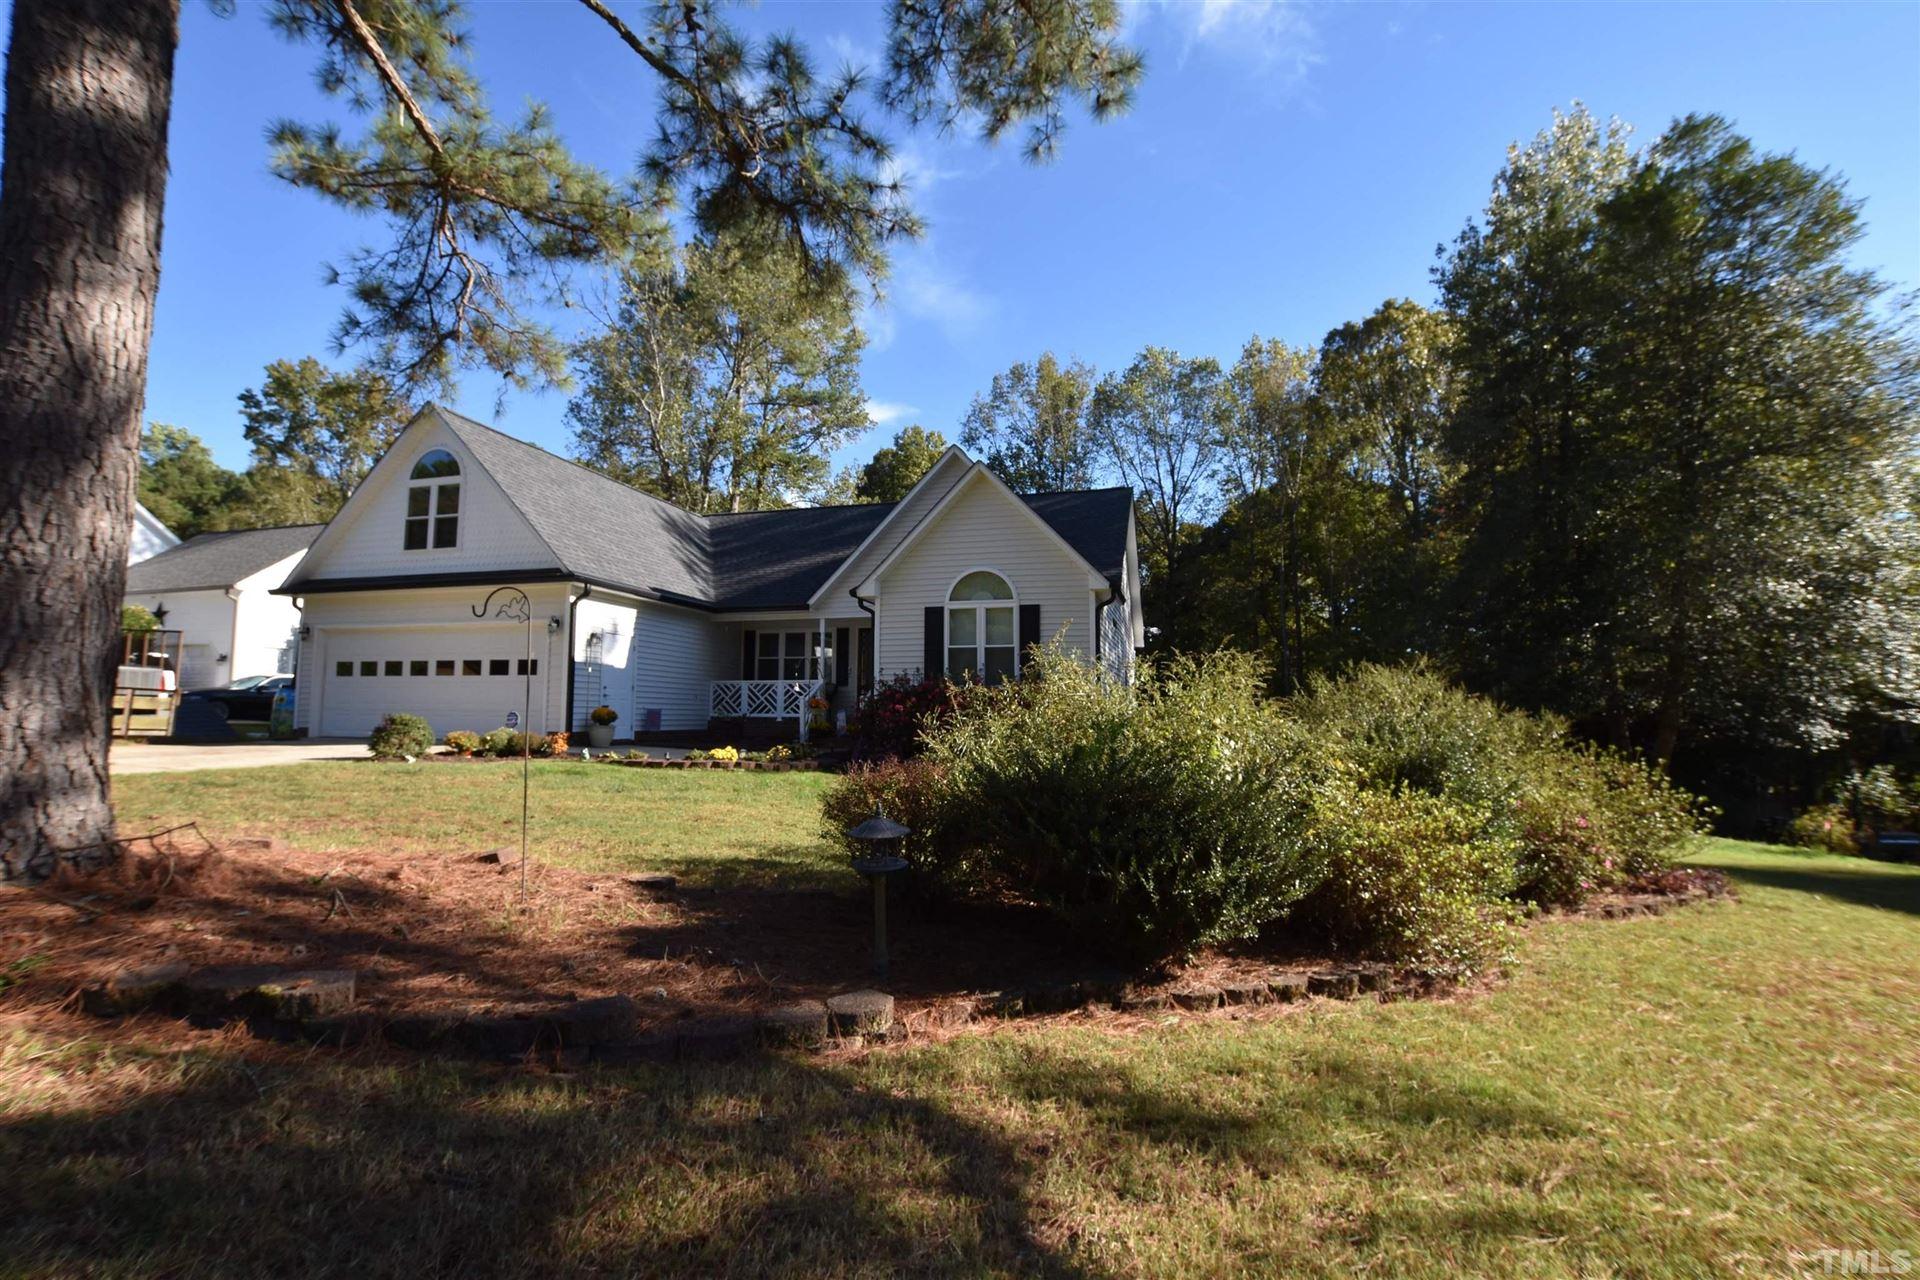 Photo of 115 Mark Lane, Raleigh, NC 27603 (MLS # 2415788)